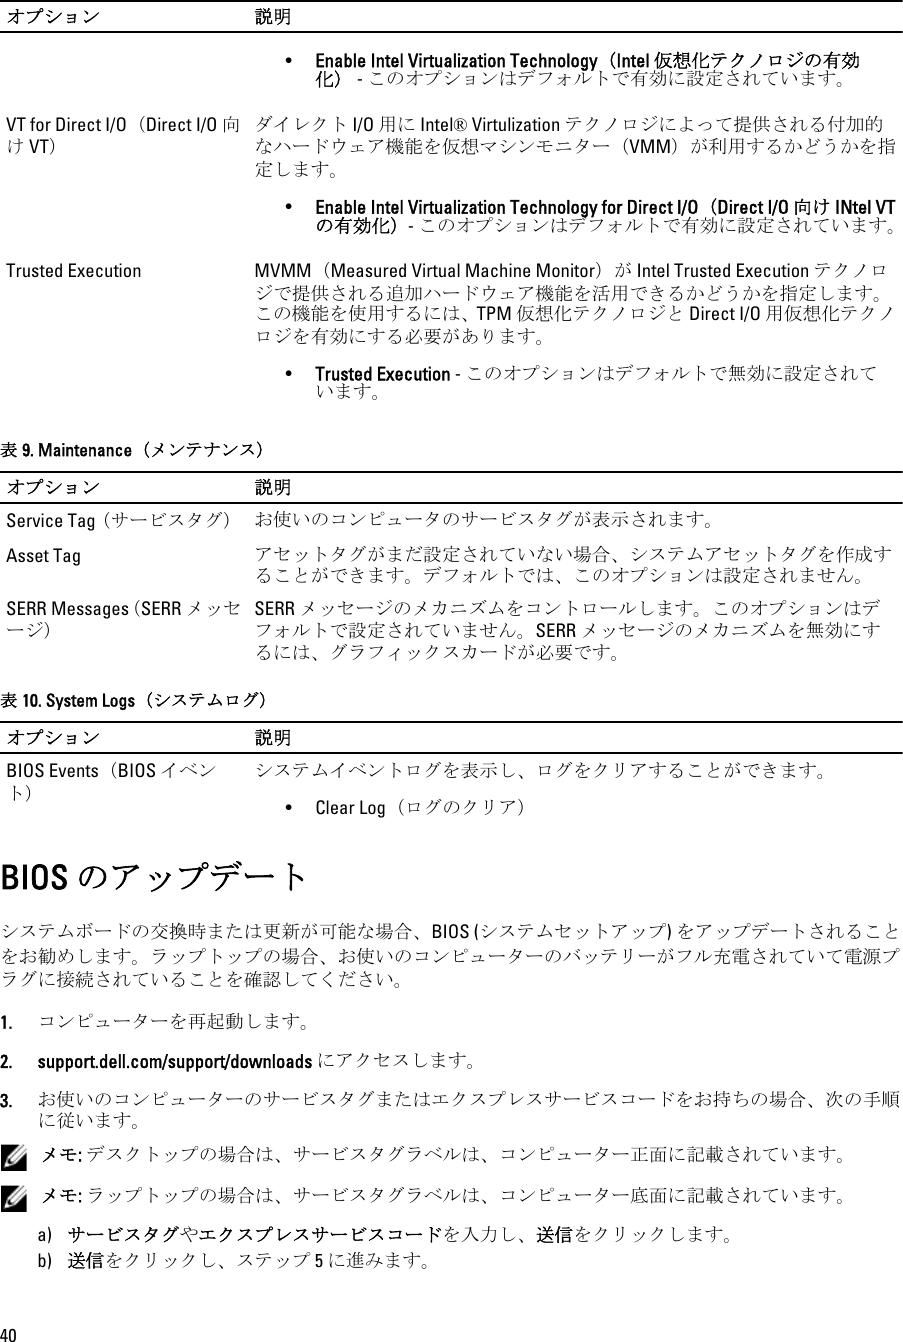 Dell Personal Computer D09M004 Users Manual Precision T1650